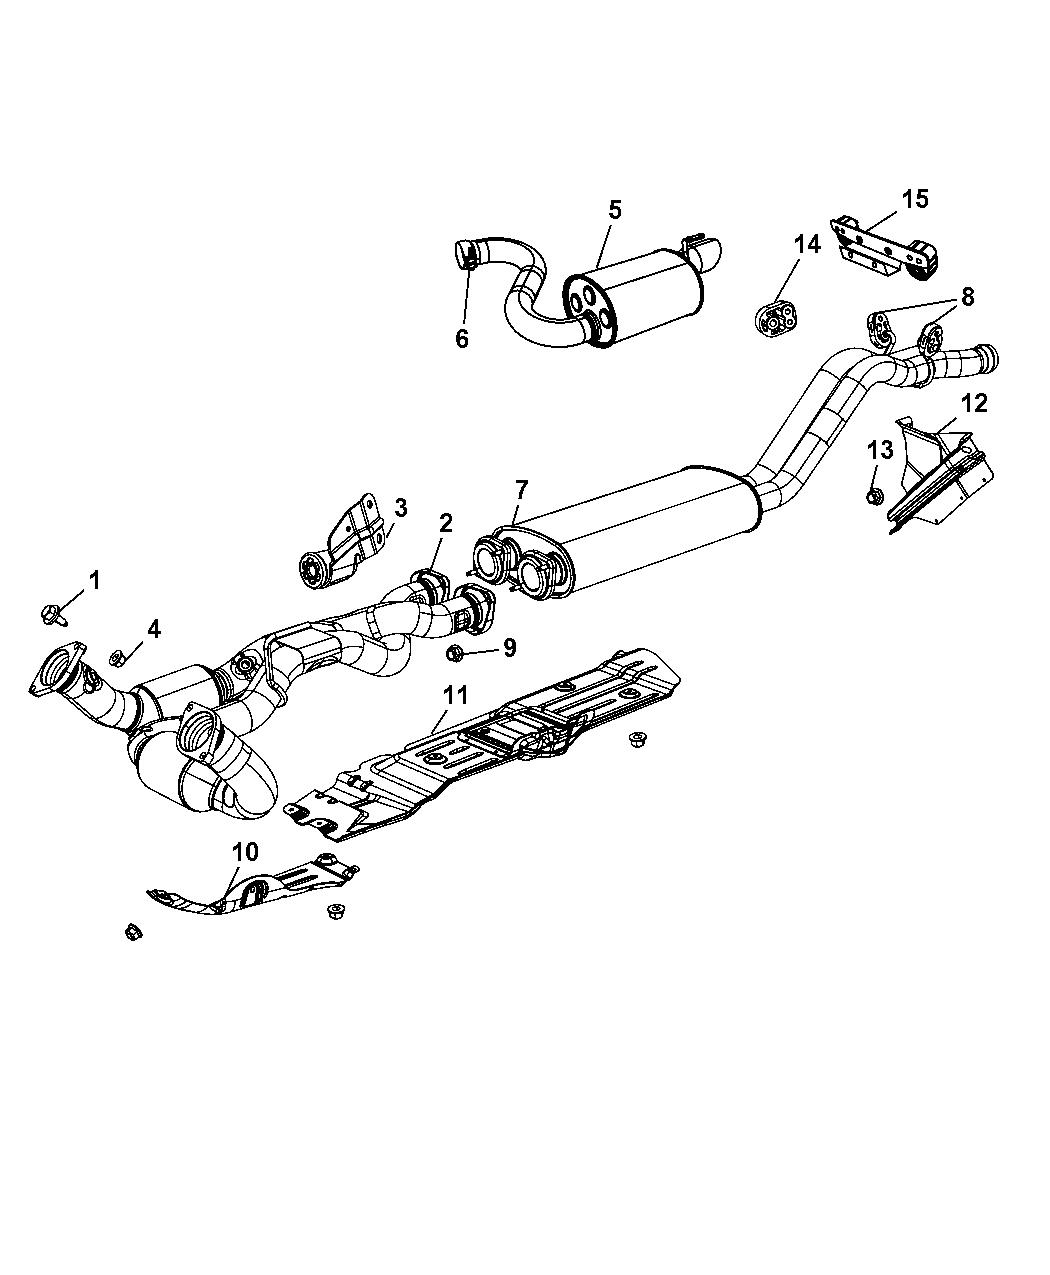 5290726aa Genuine Jeep Muffler Exhaust System Diagram 2008 Grand Cherokee